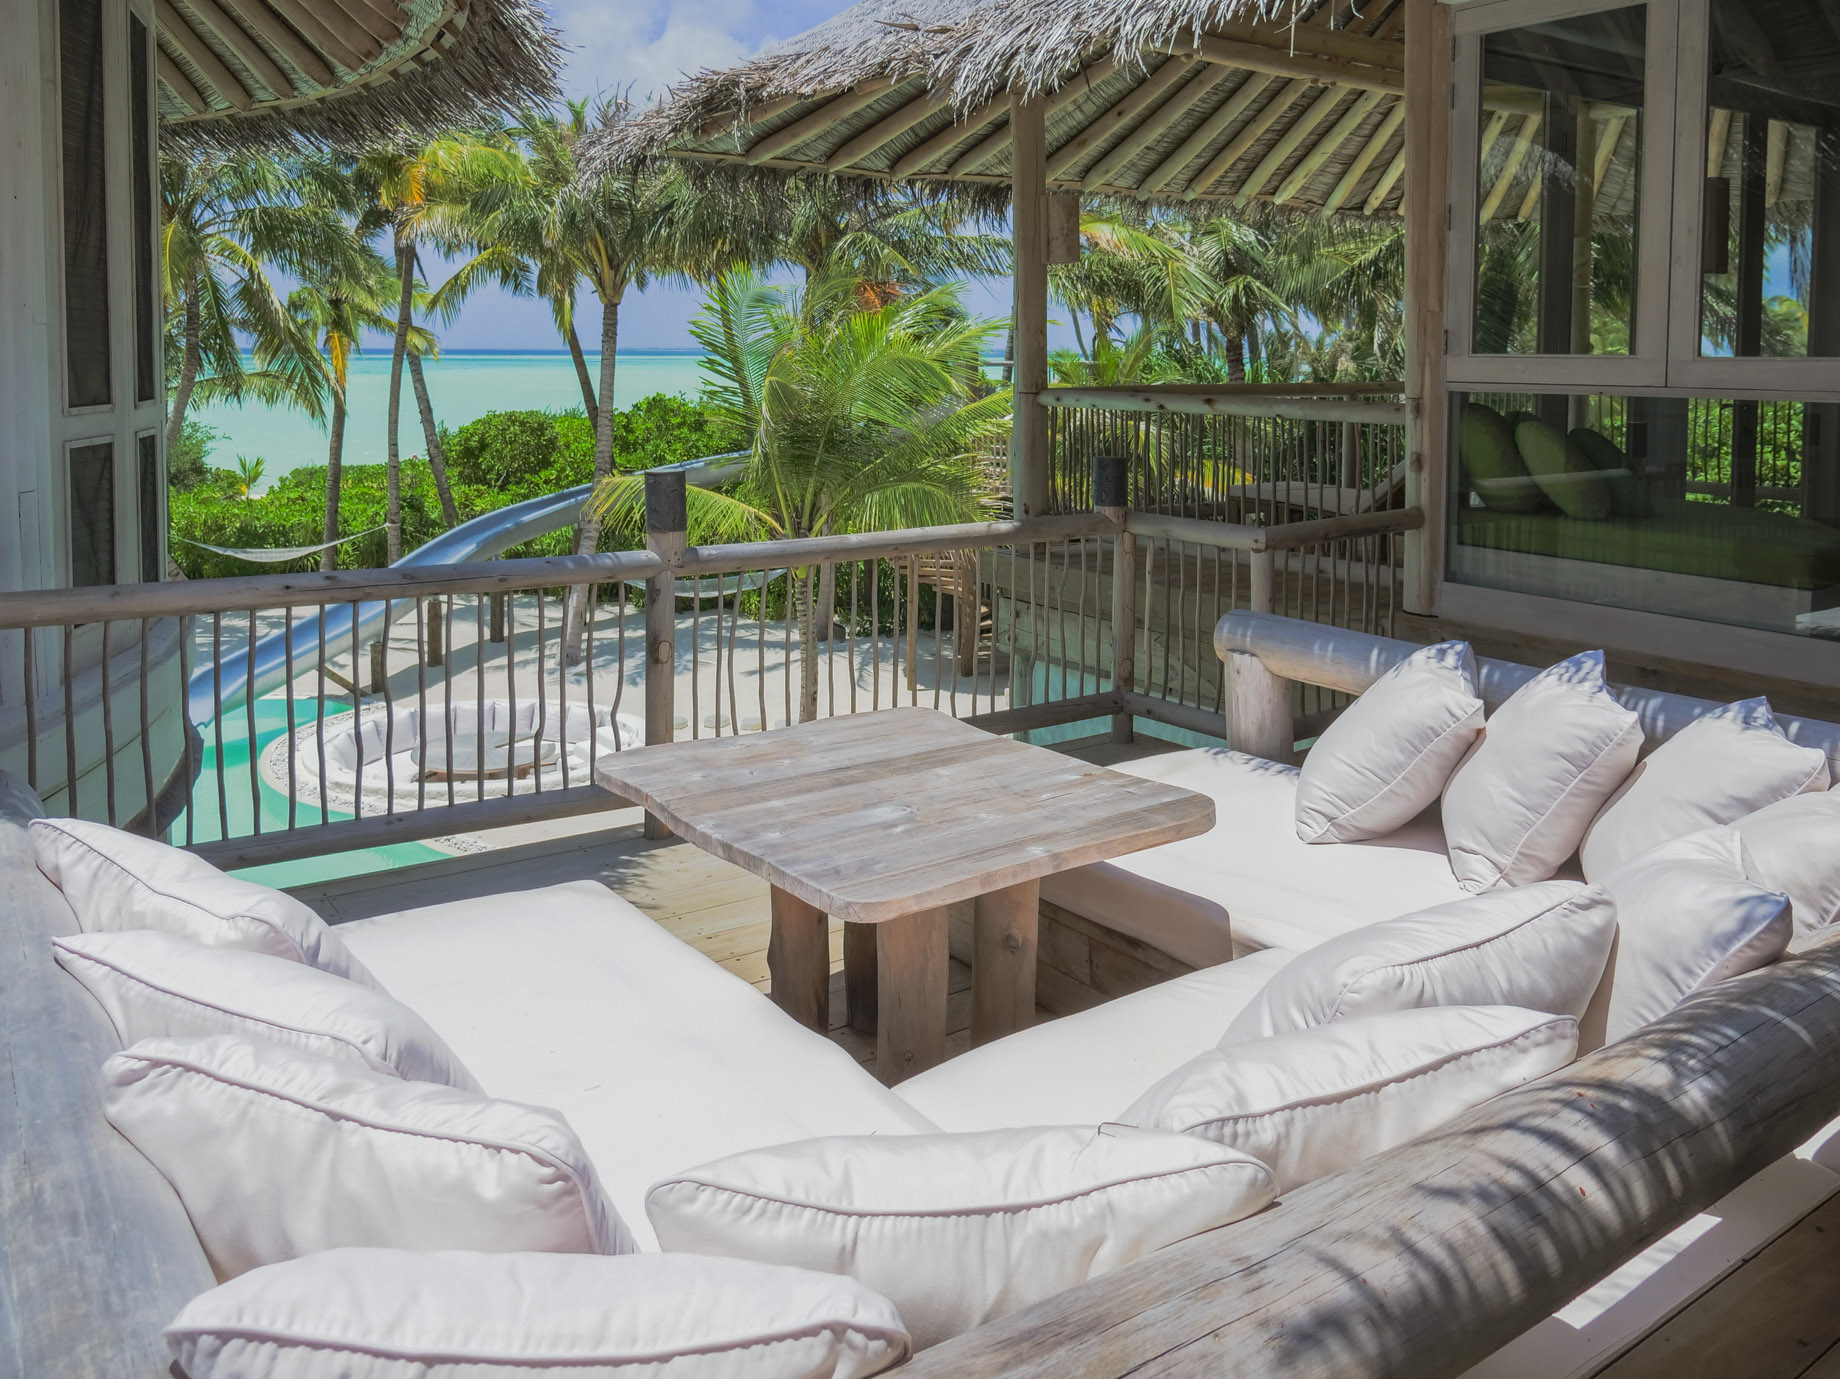 Soneva Jani Luxury Resort - Noonu Atoll, Medhufaru, Maldives - 4 Bedroom Island Reserve Villa Upper Deck Ocean View